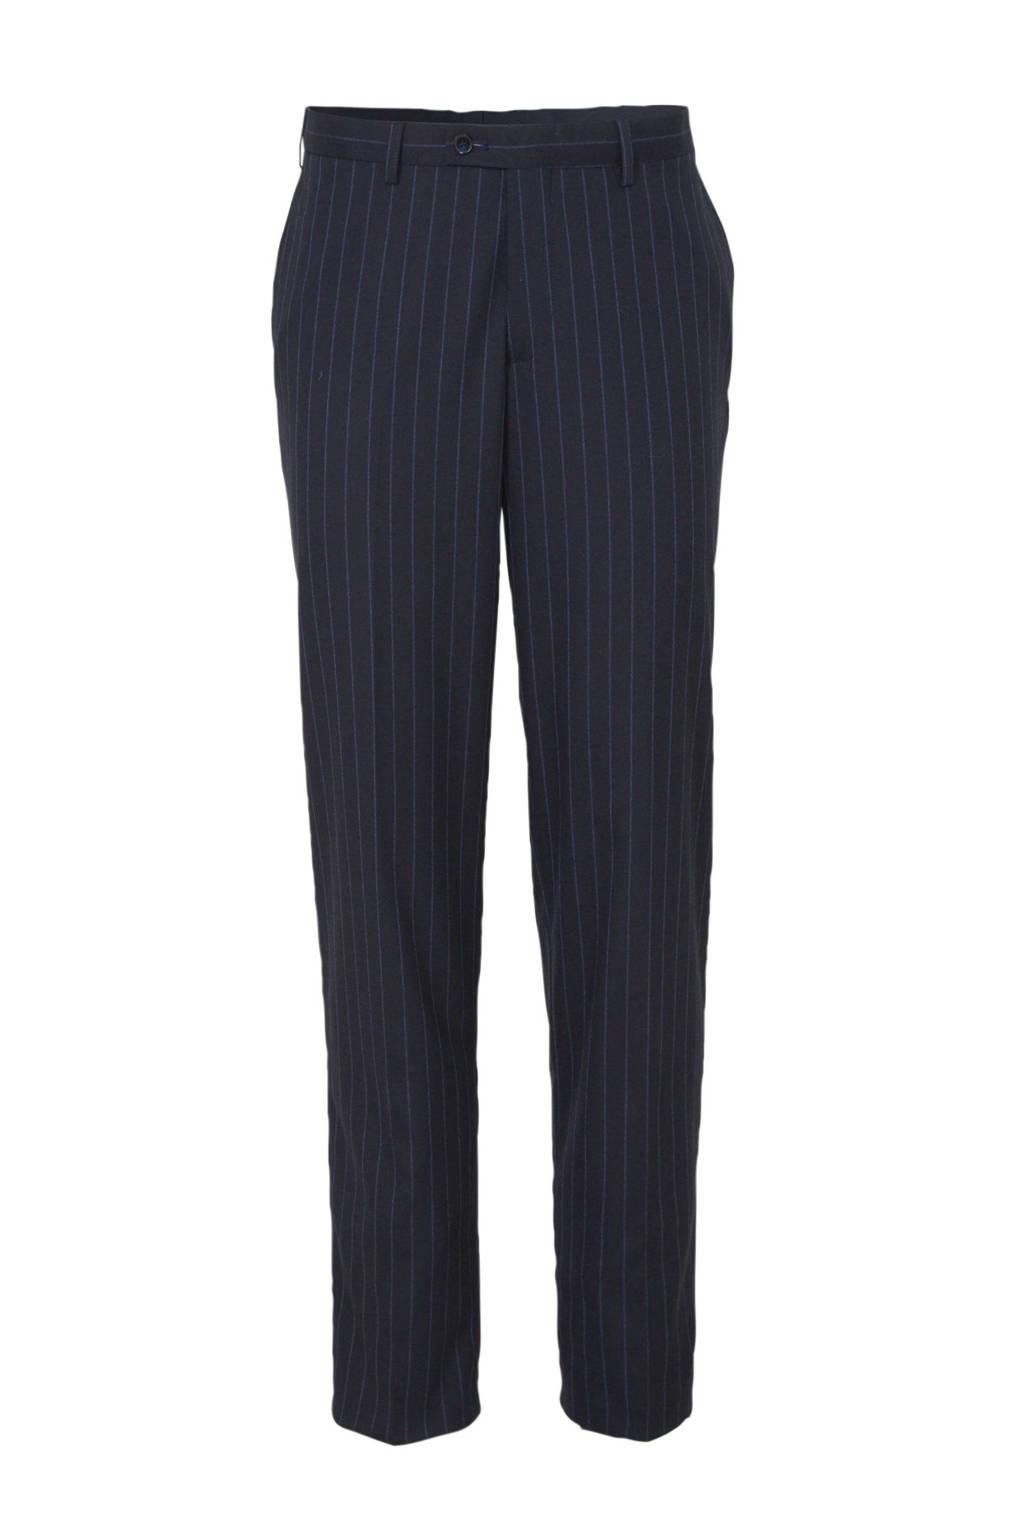 C&A Angelo Litrico gestreepte slim fit pantalon donkerblauw, Donkerblauw